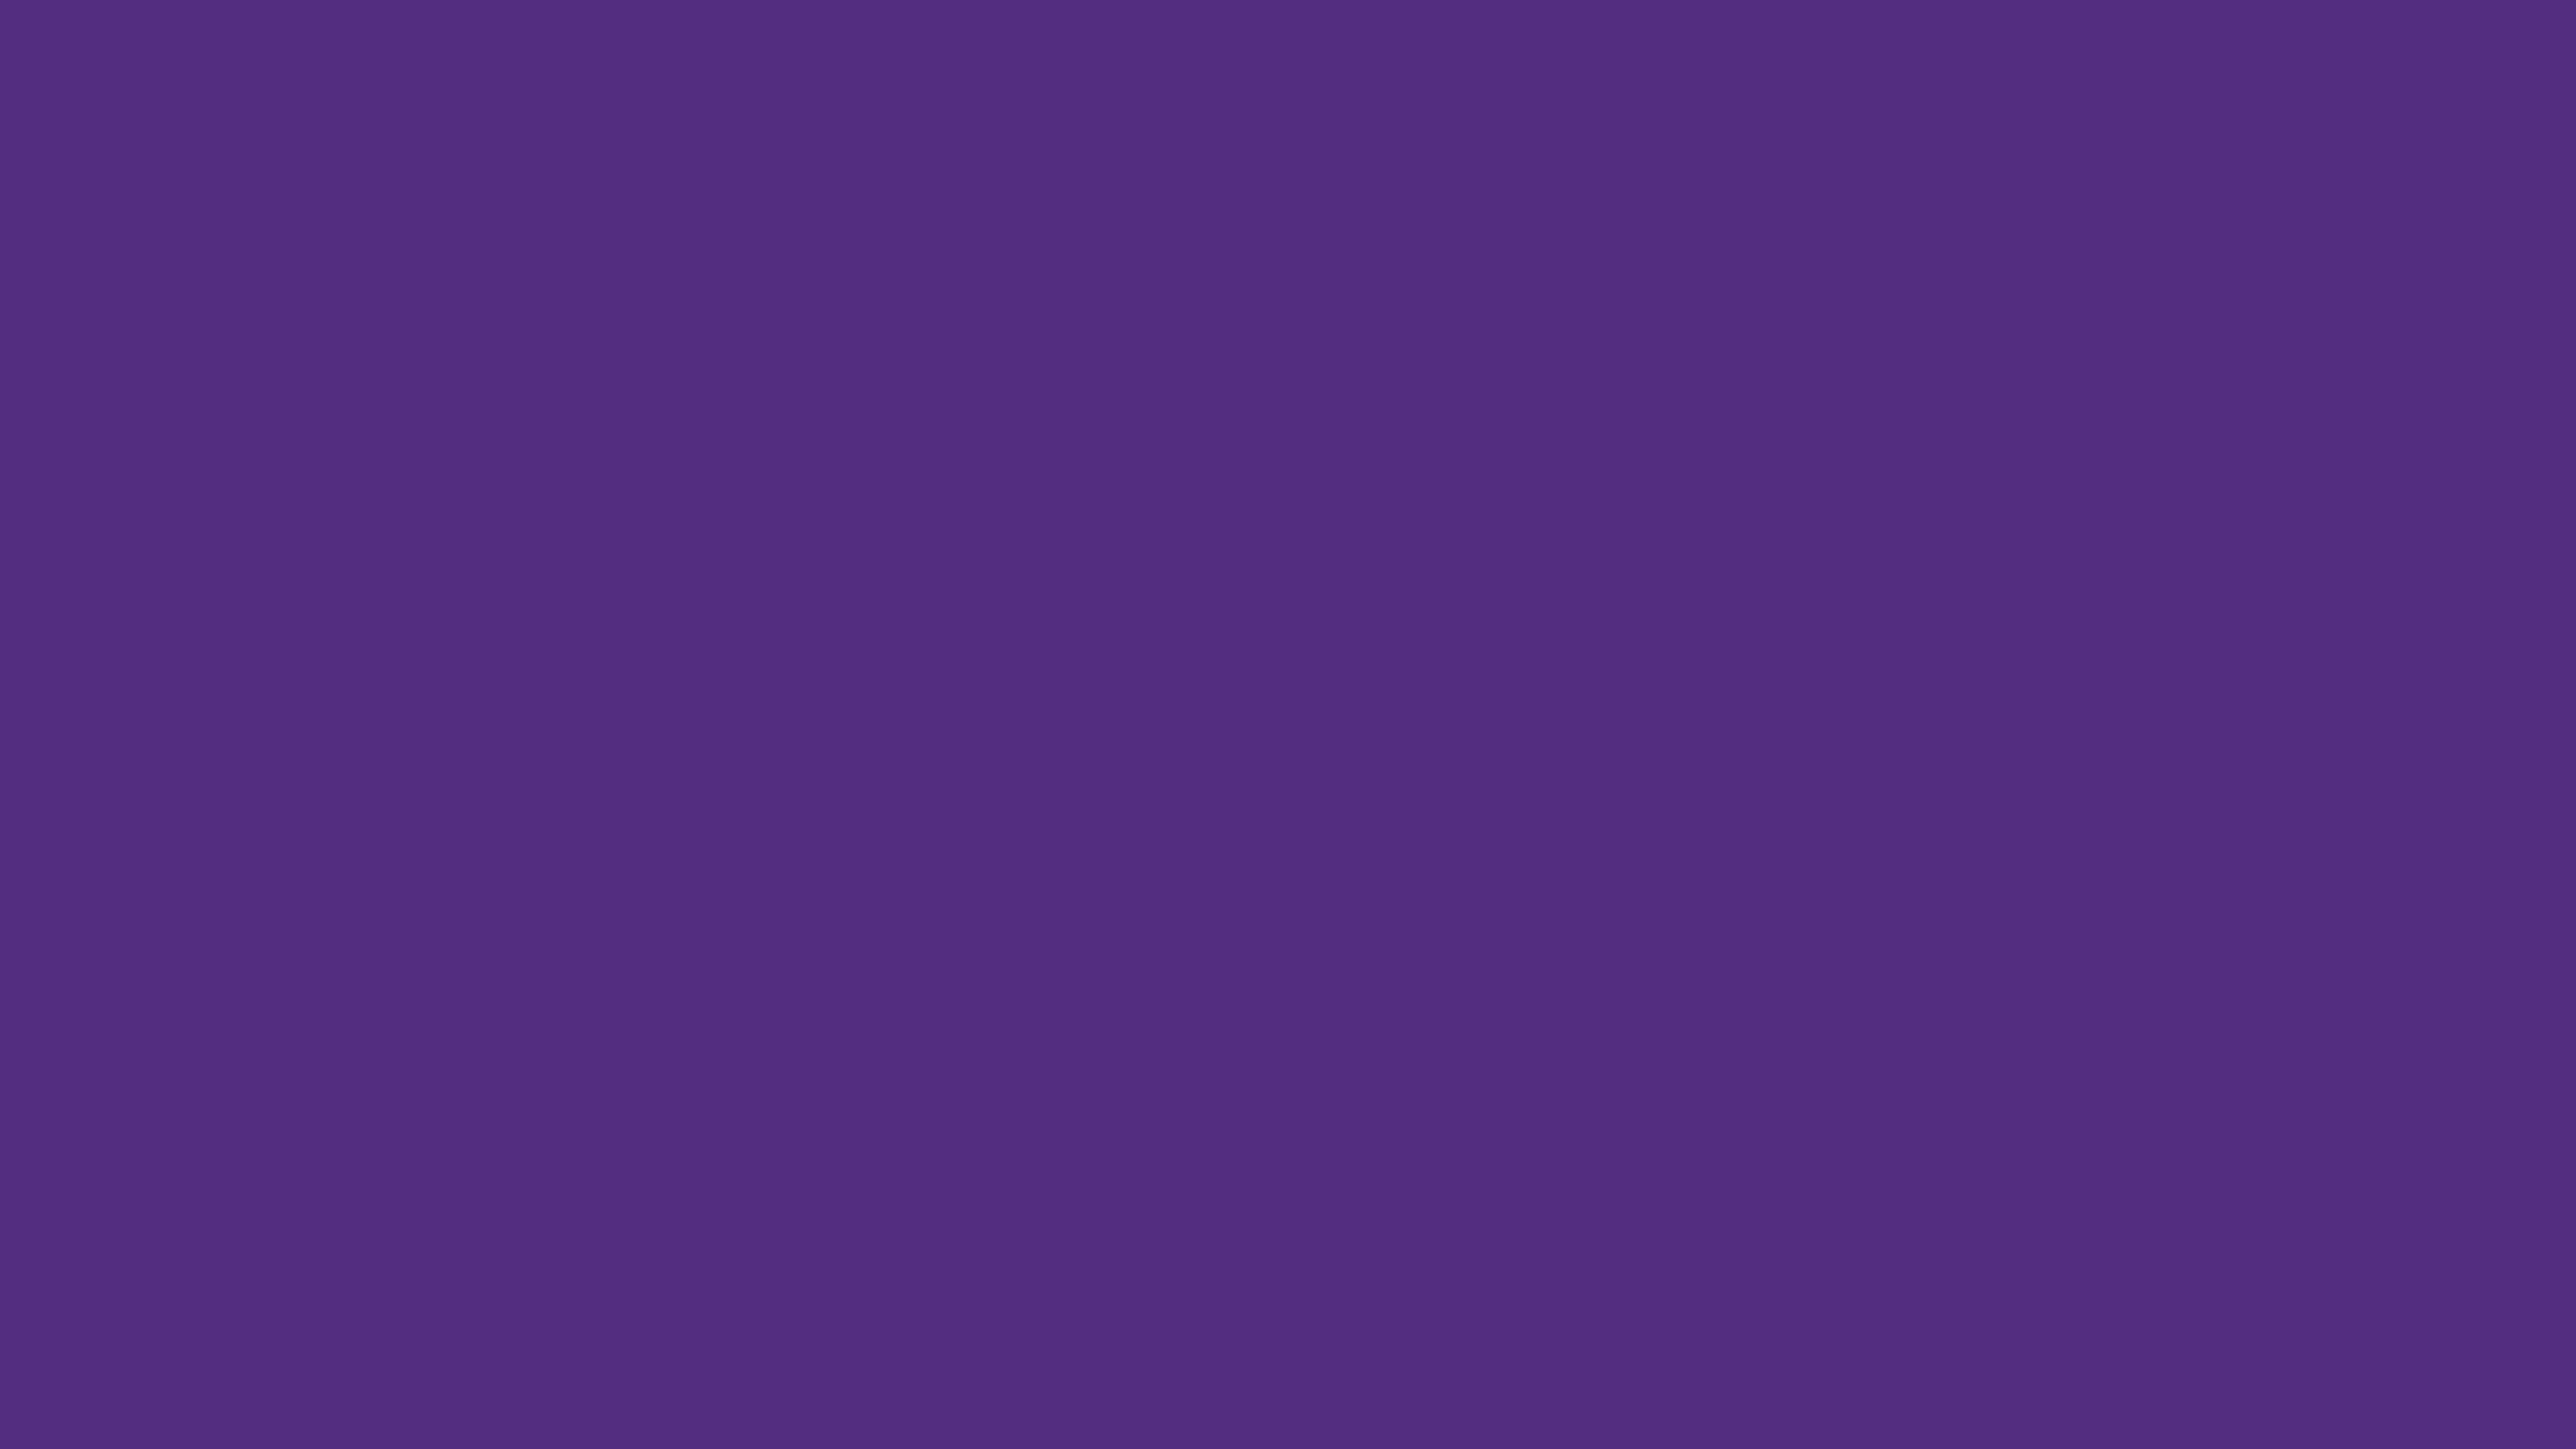 3840x2160 Regalia Solid Color Background